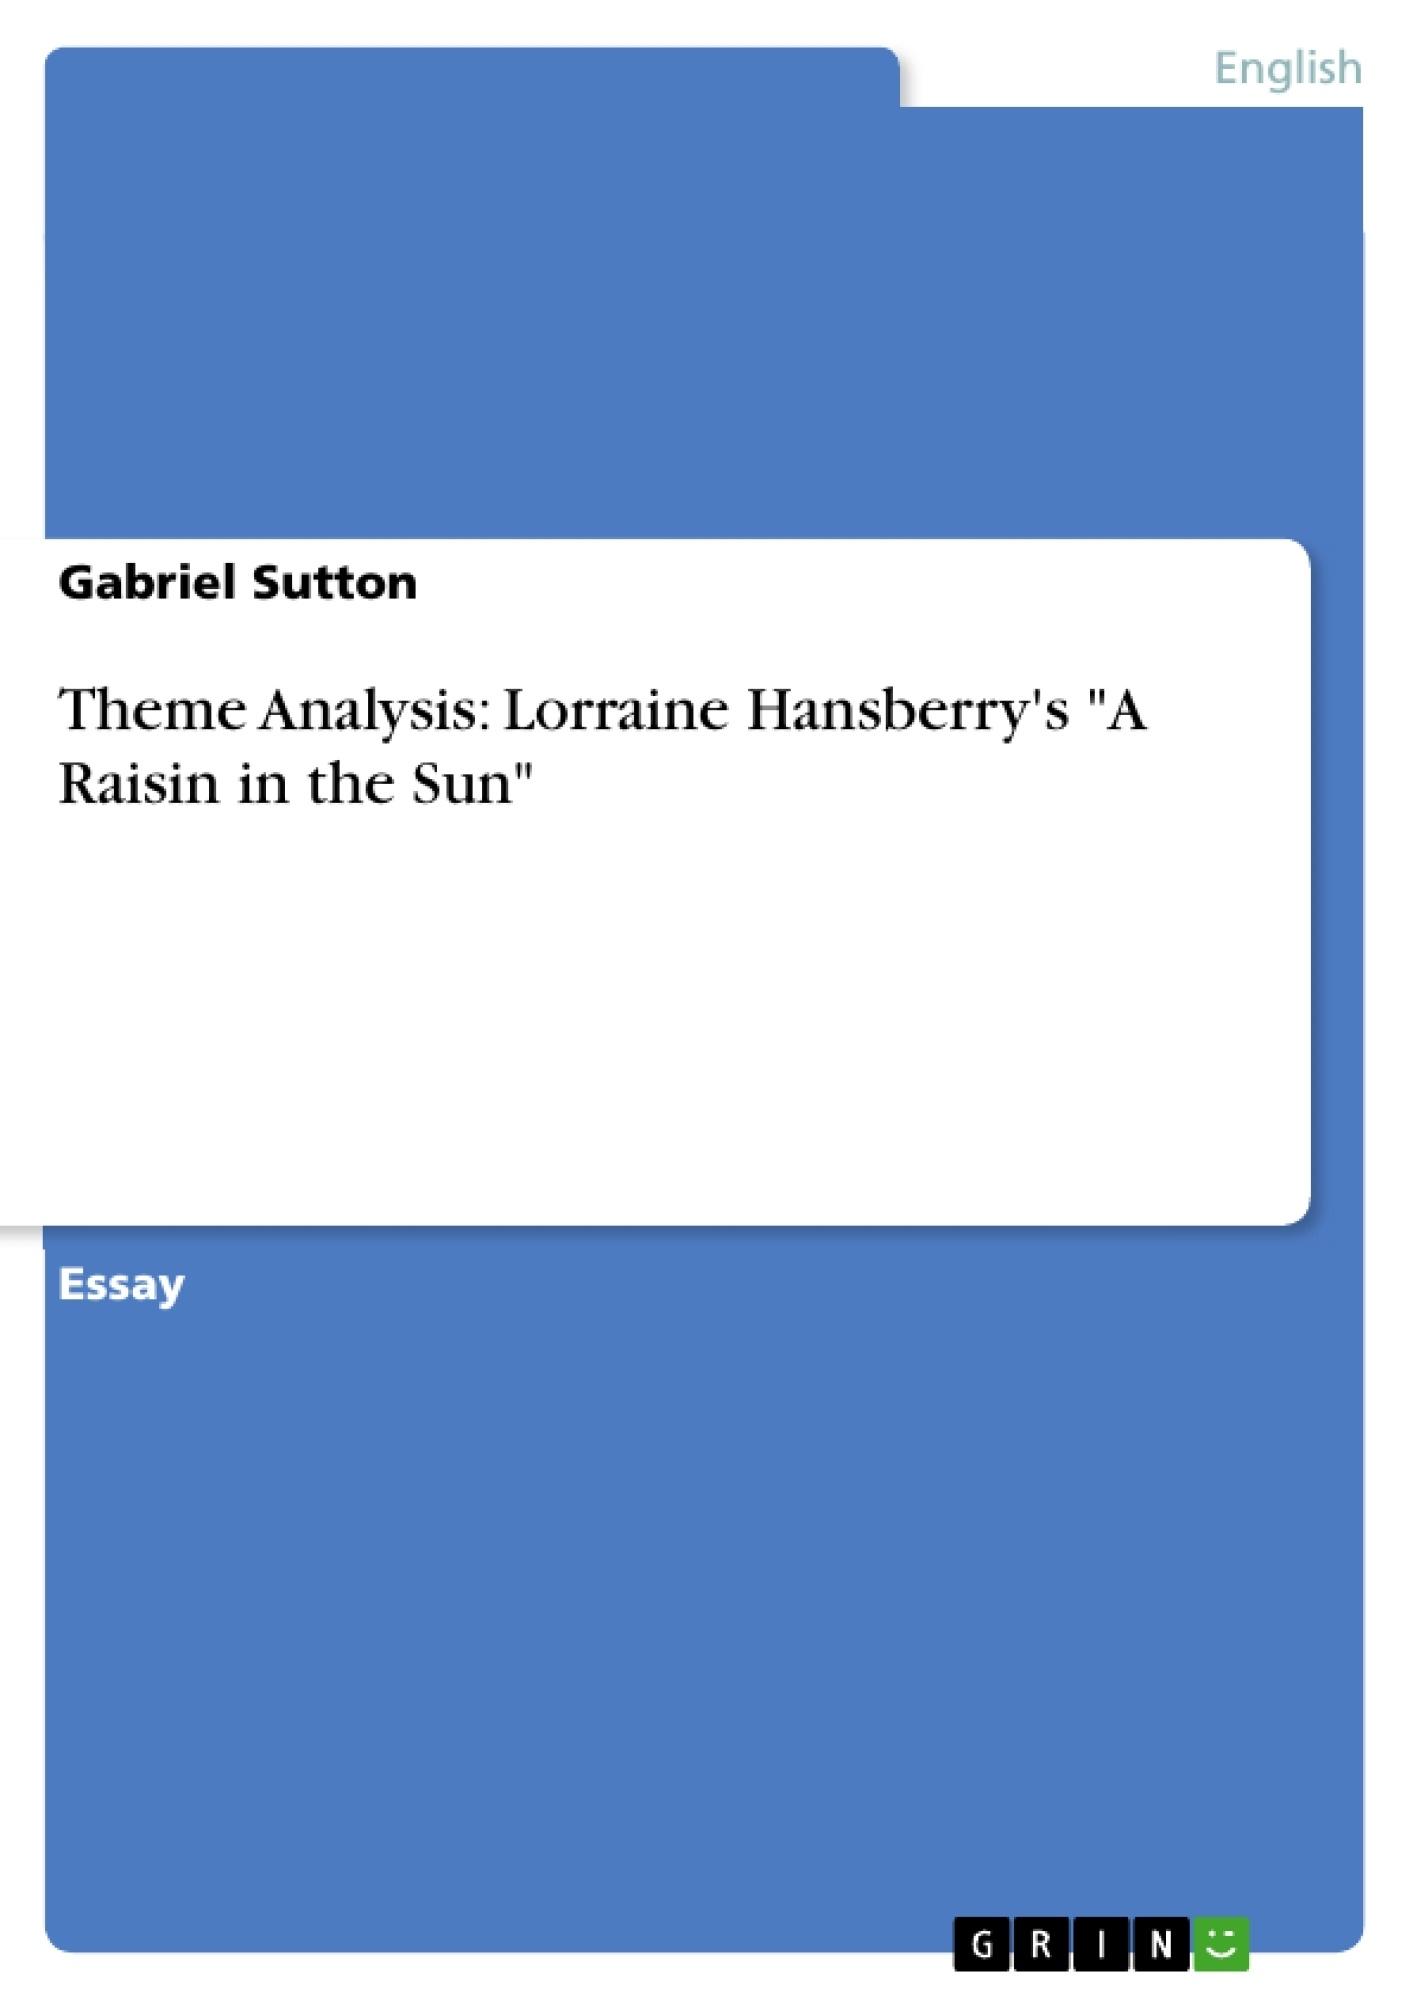 004 Essay Example Raisin In The Sun Themes 198903 0 Beautiful A Theme Analysis Full